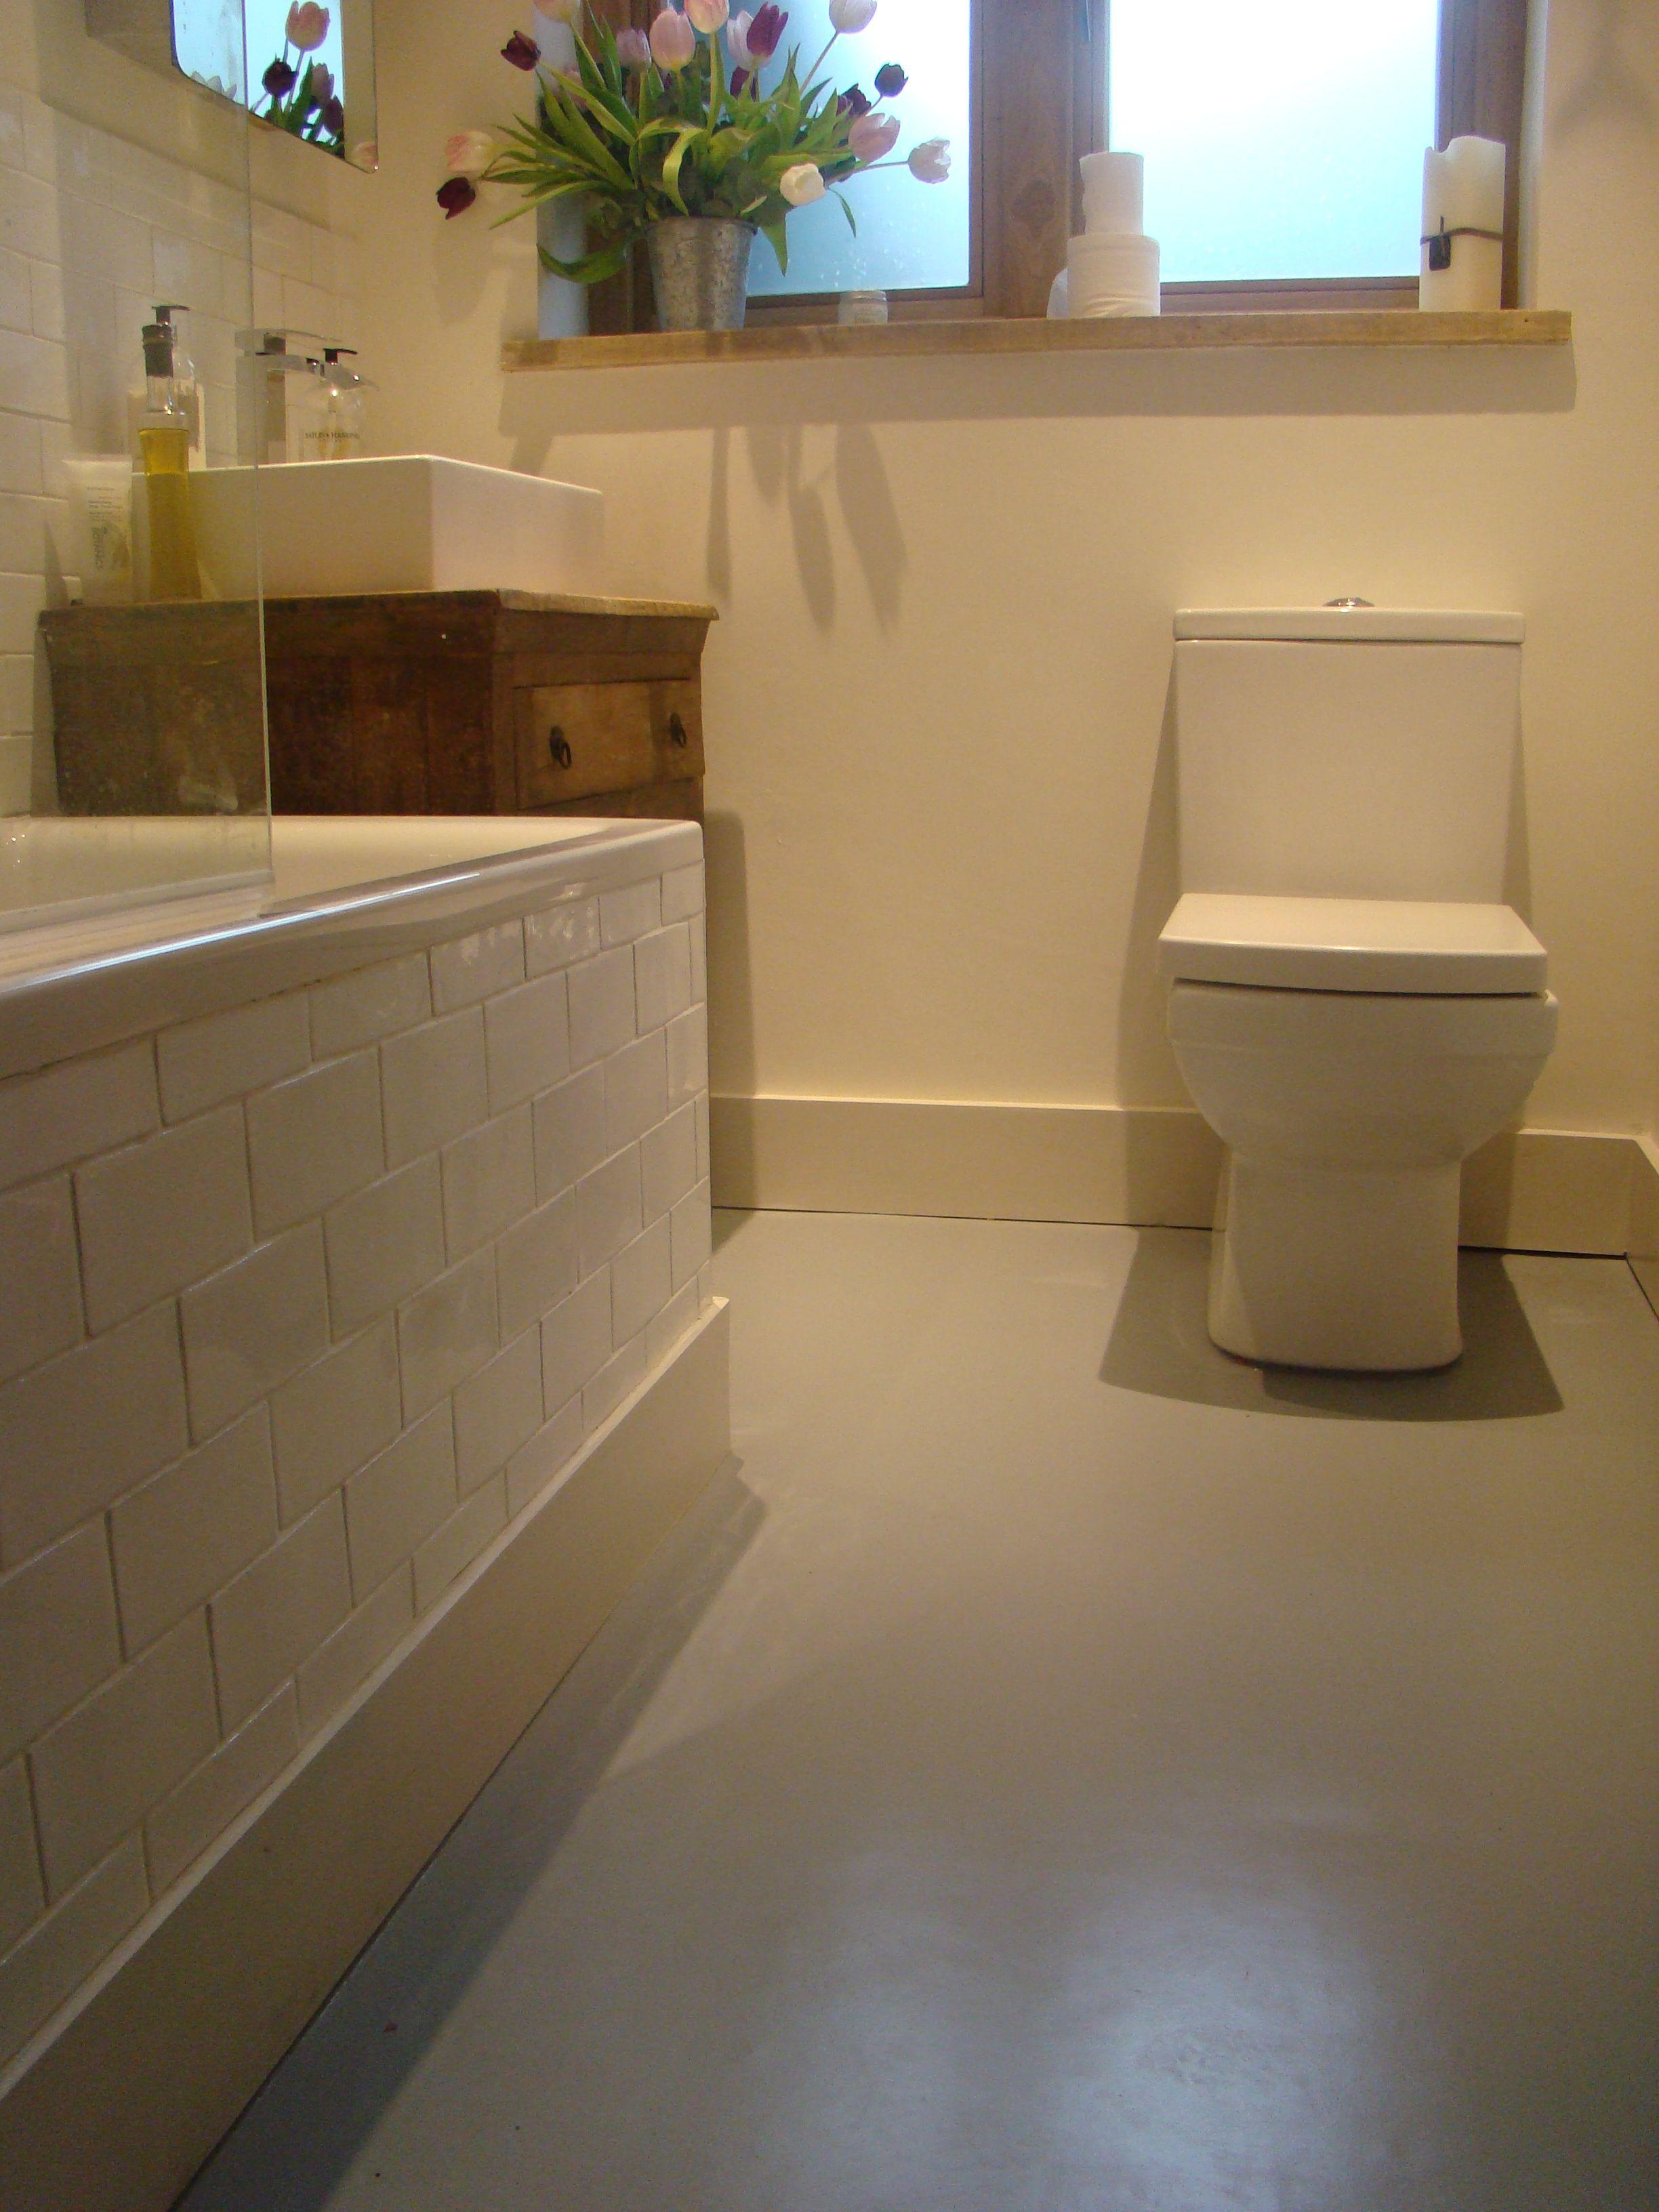 Smooth Sheet Rubber Flooring In Bathroom Rubber Flooring